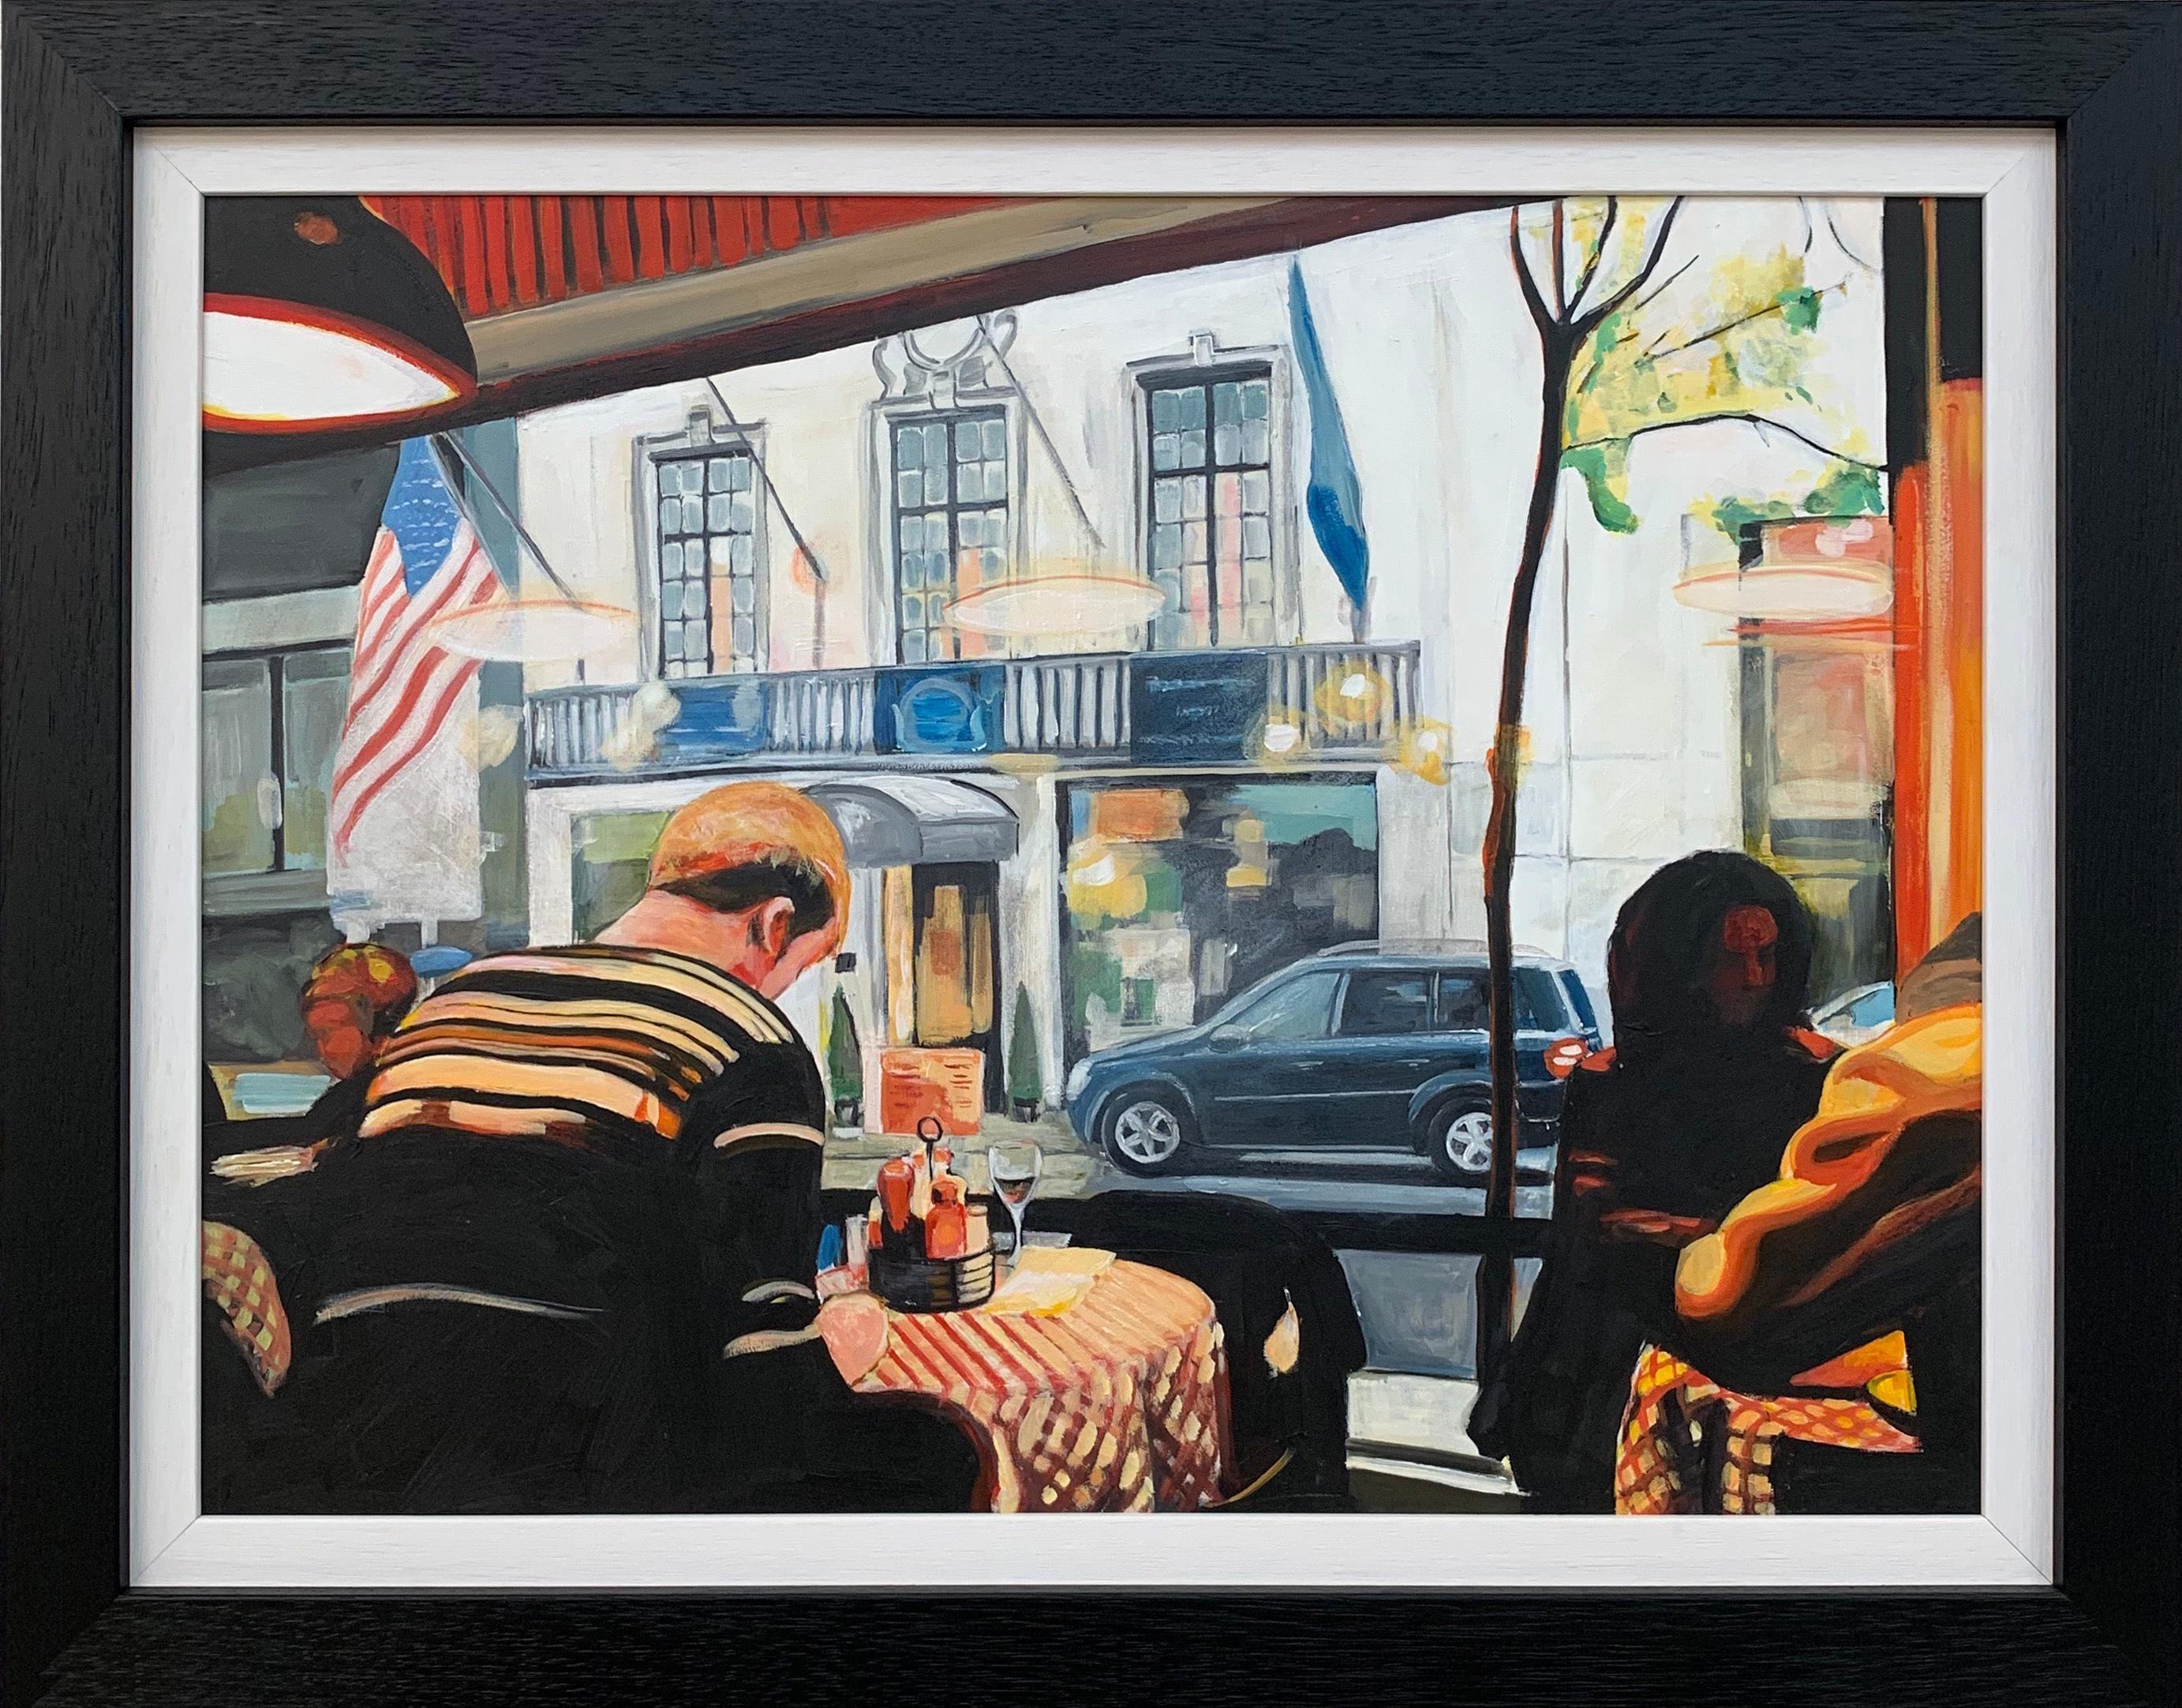 Still Life Painting of American Diner Interior New York City by British Artist